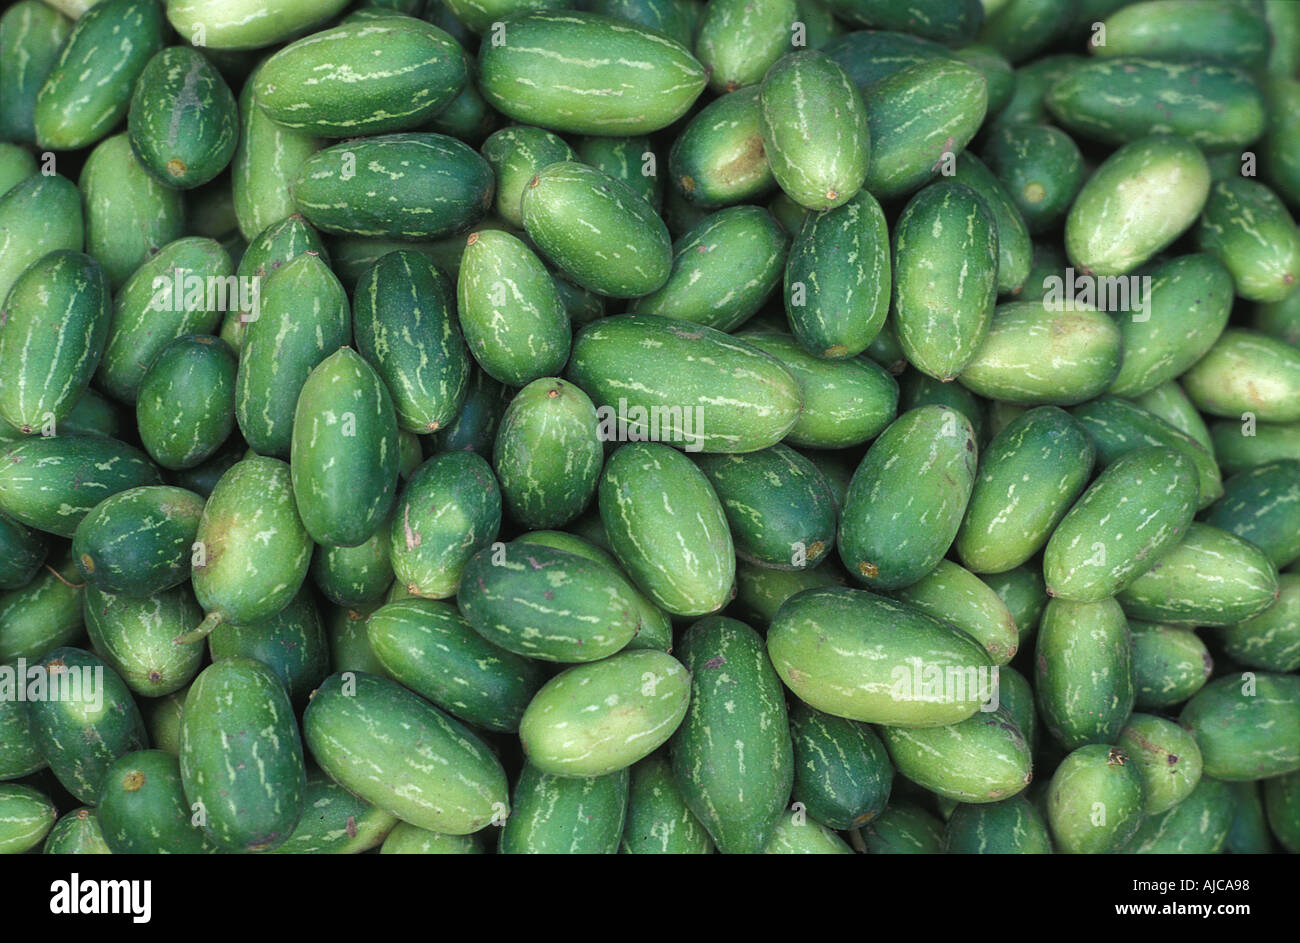 Fruit and vegetable stalls at market Varanasi India - Stock Image